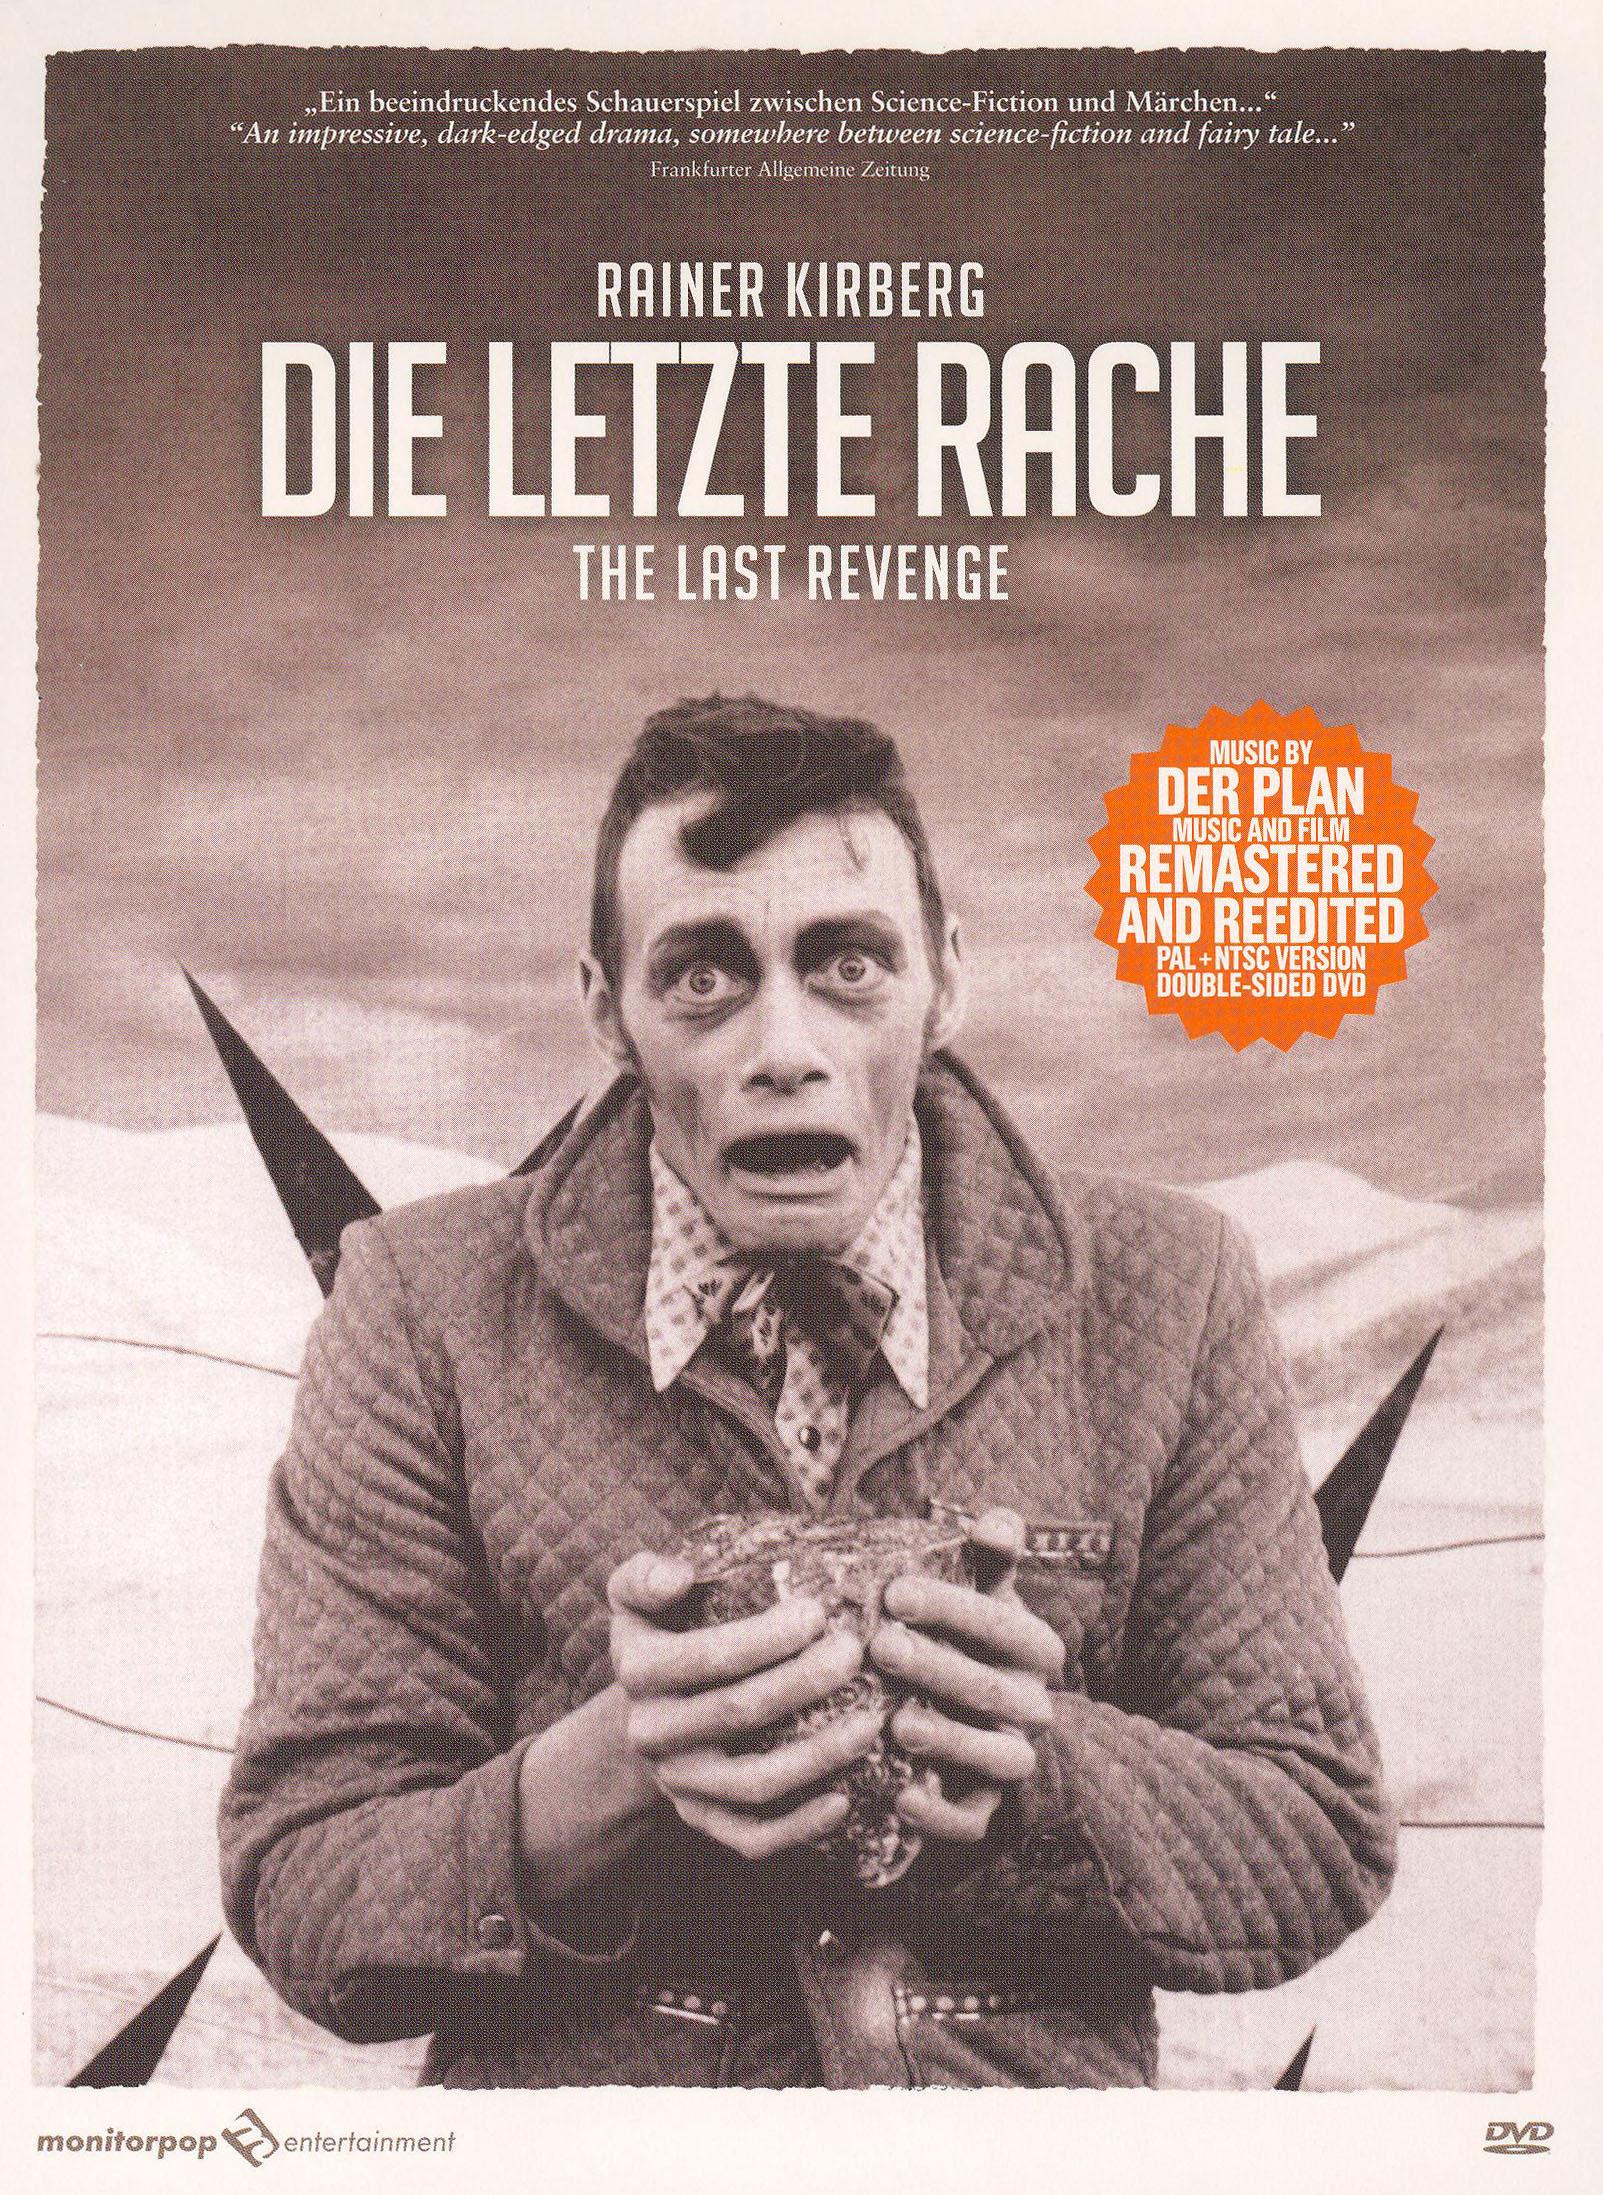 Rainer Kirberg: Die Letzte Rache